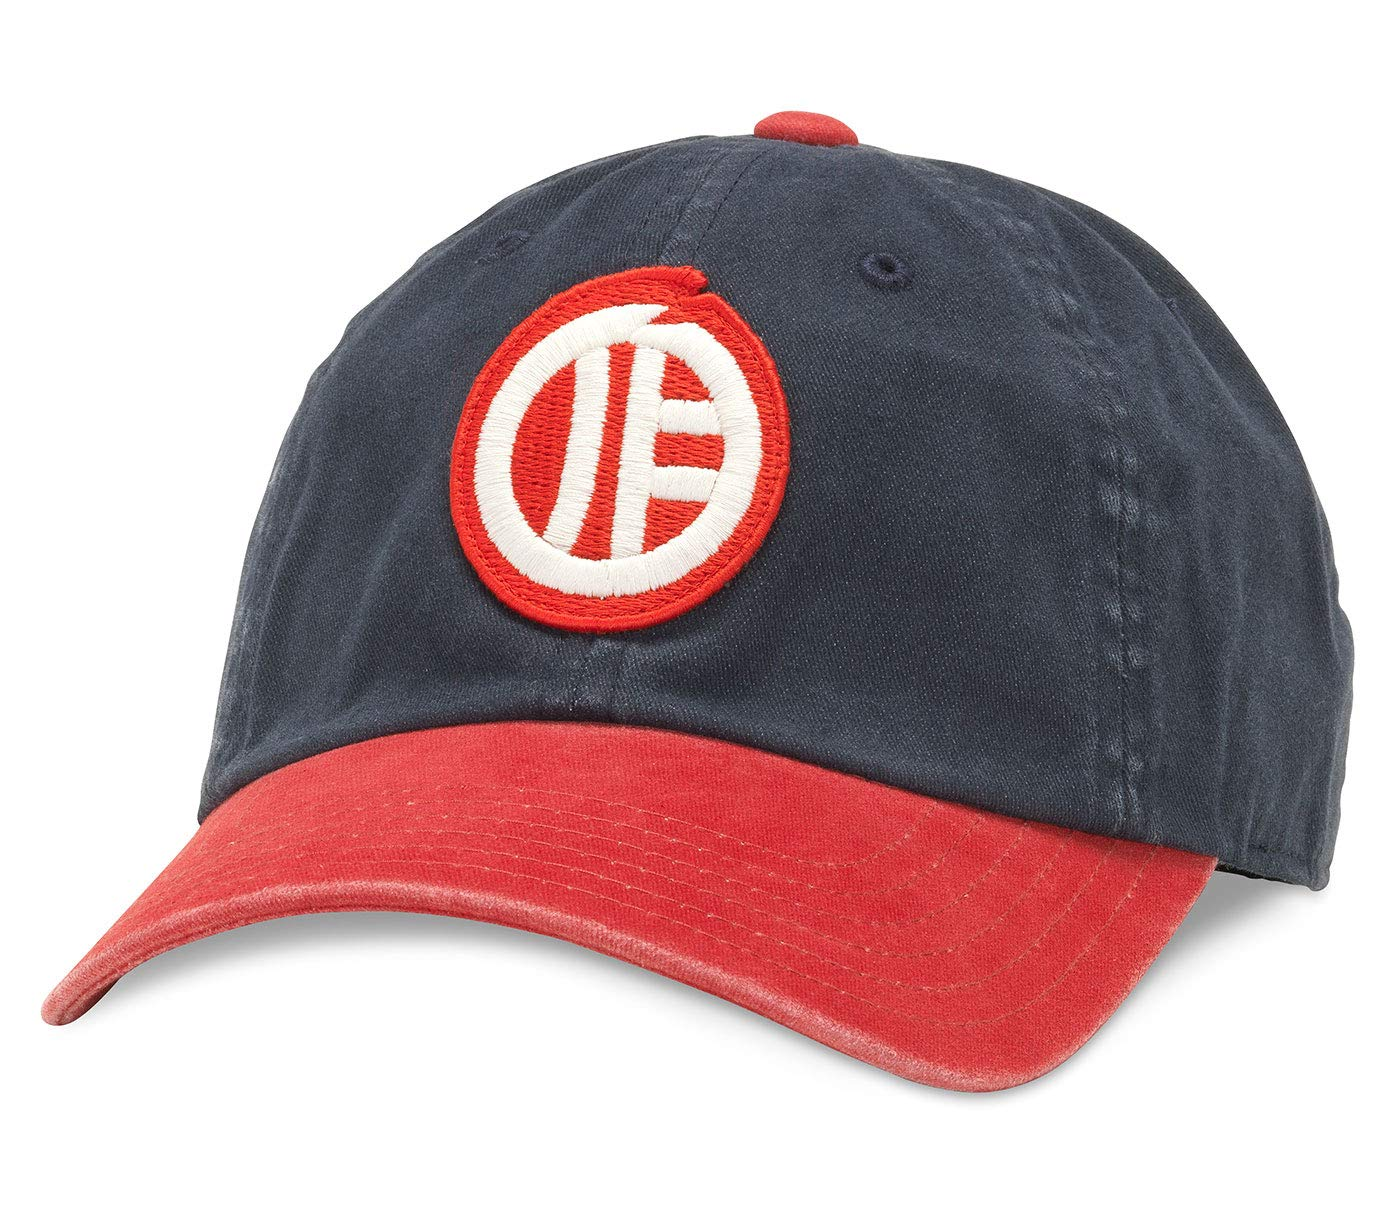 bf8675ba1770e7 Amazon.com : American Needle Archive California League Anaheim Aces  Baseball Dad Hat (44740A-ANA-BLDR) : Sports & Outdoors